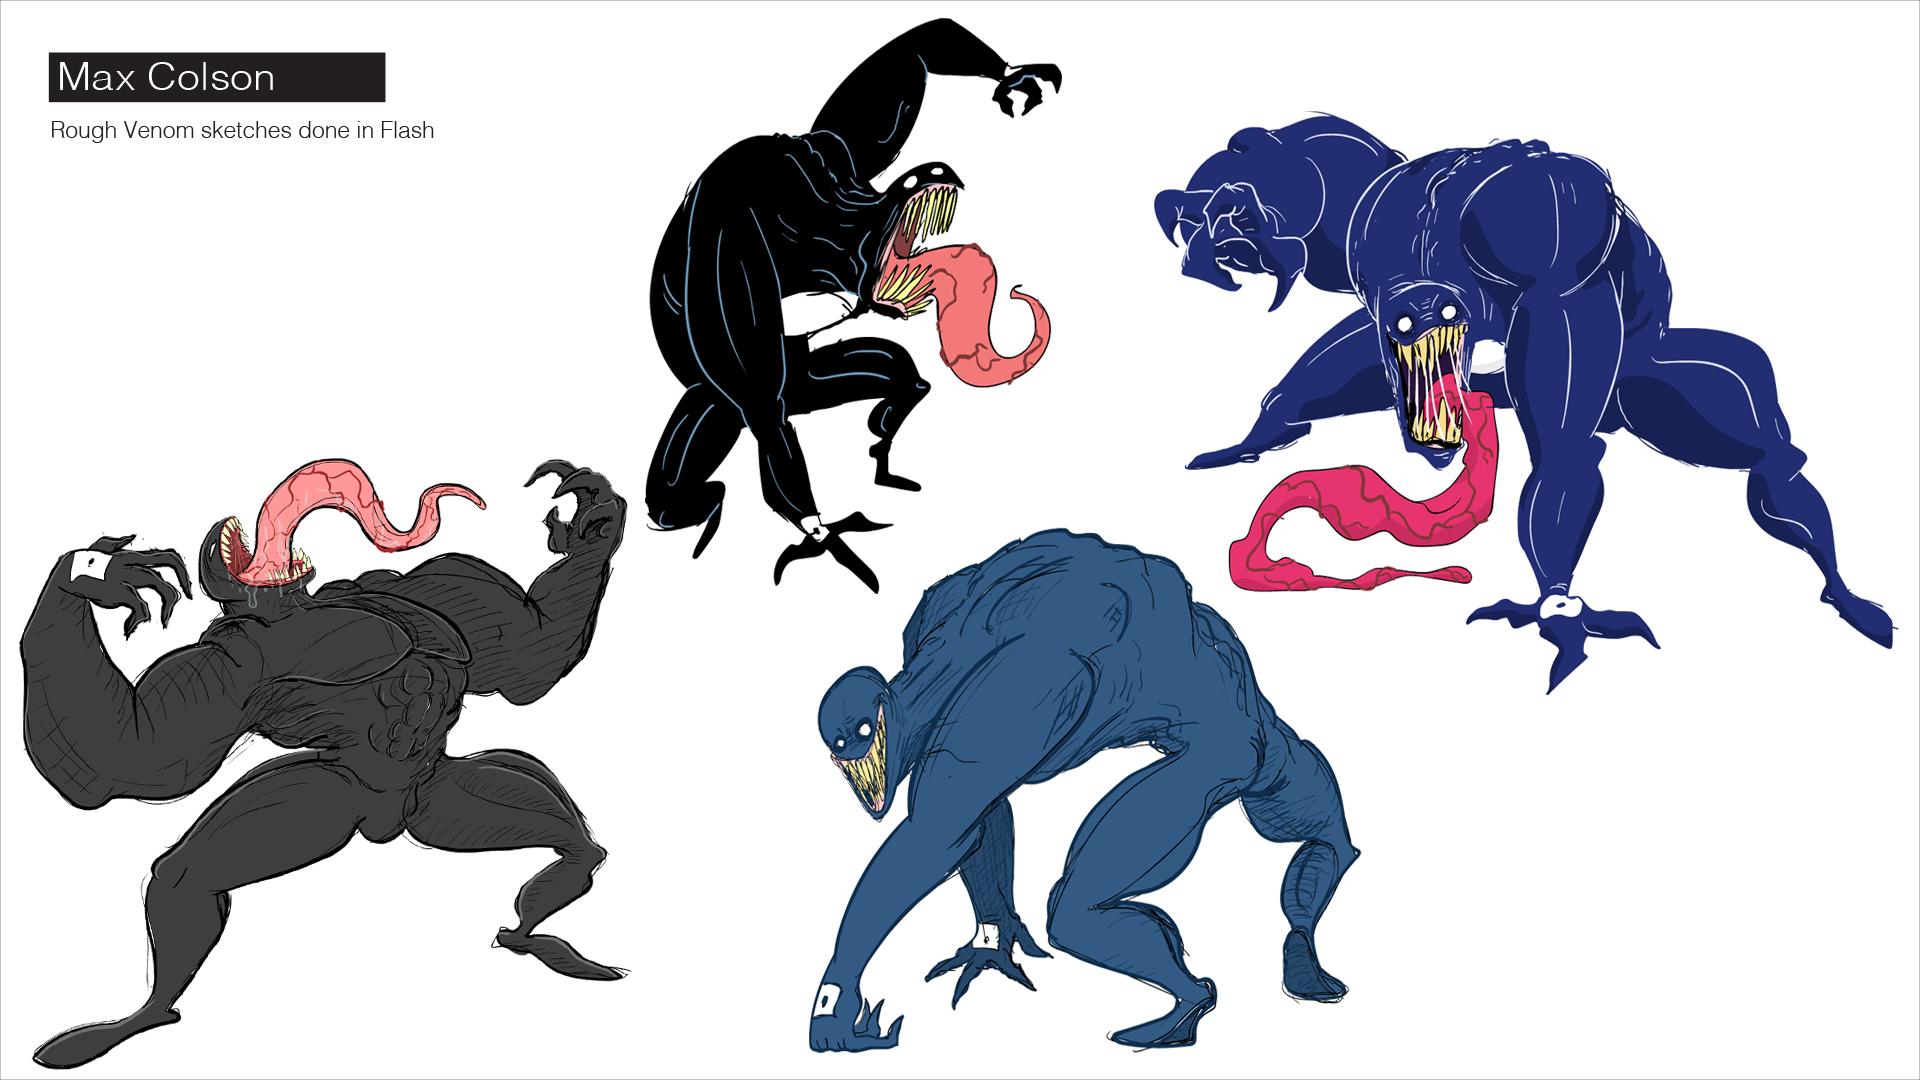 venom sketches